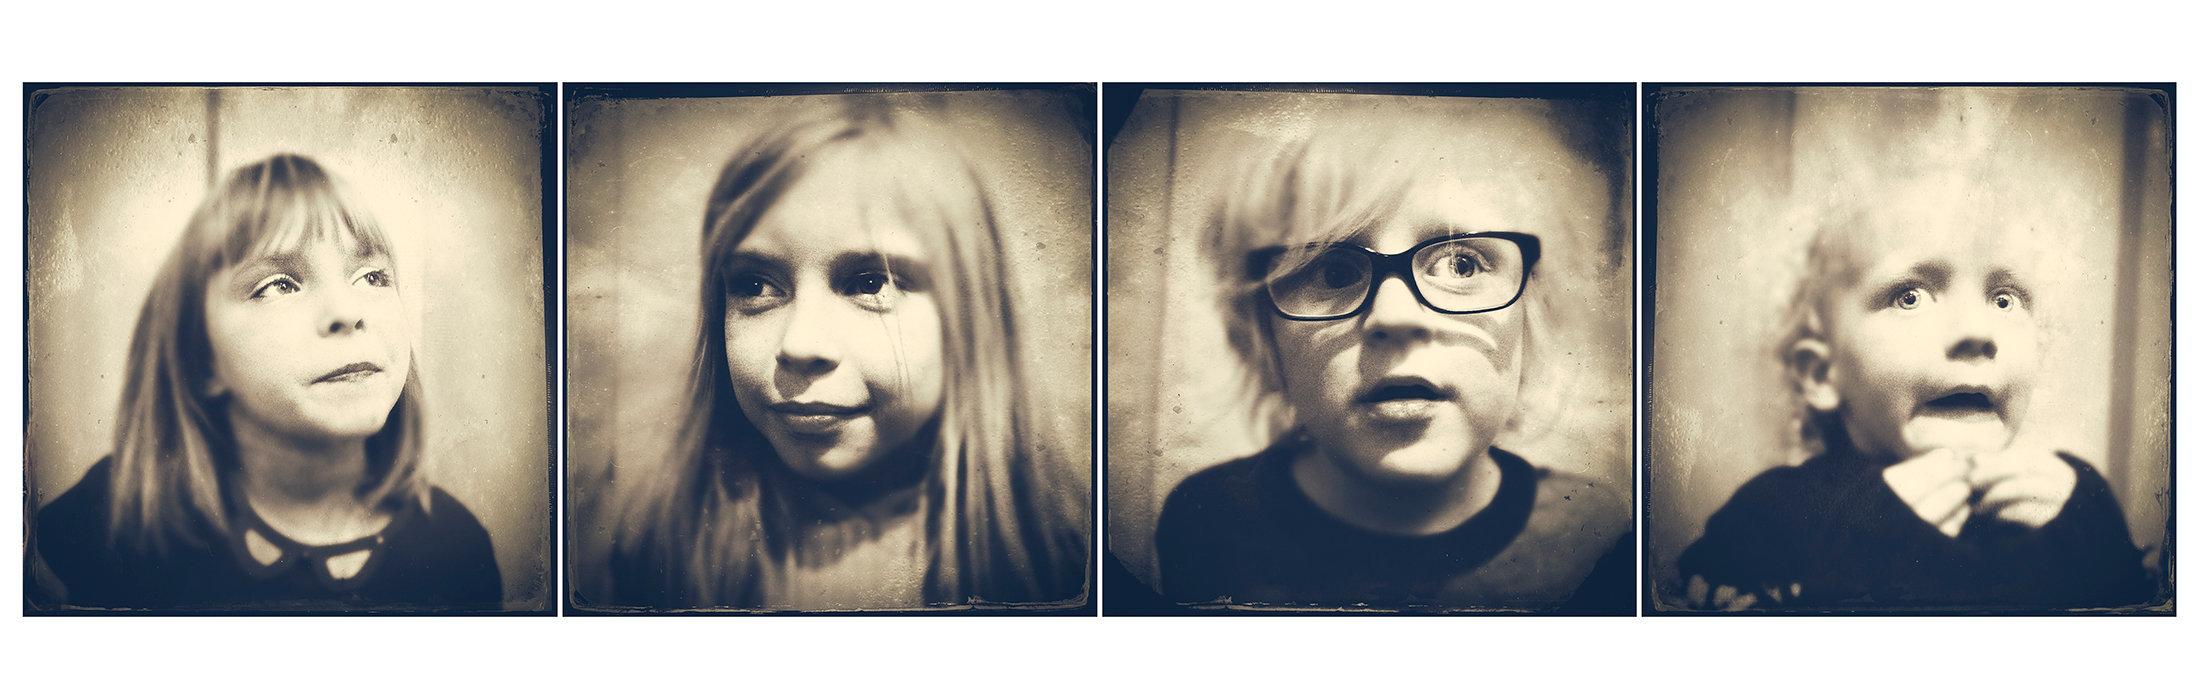 Kids Comp.jpg